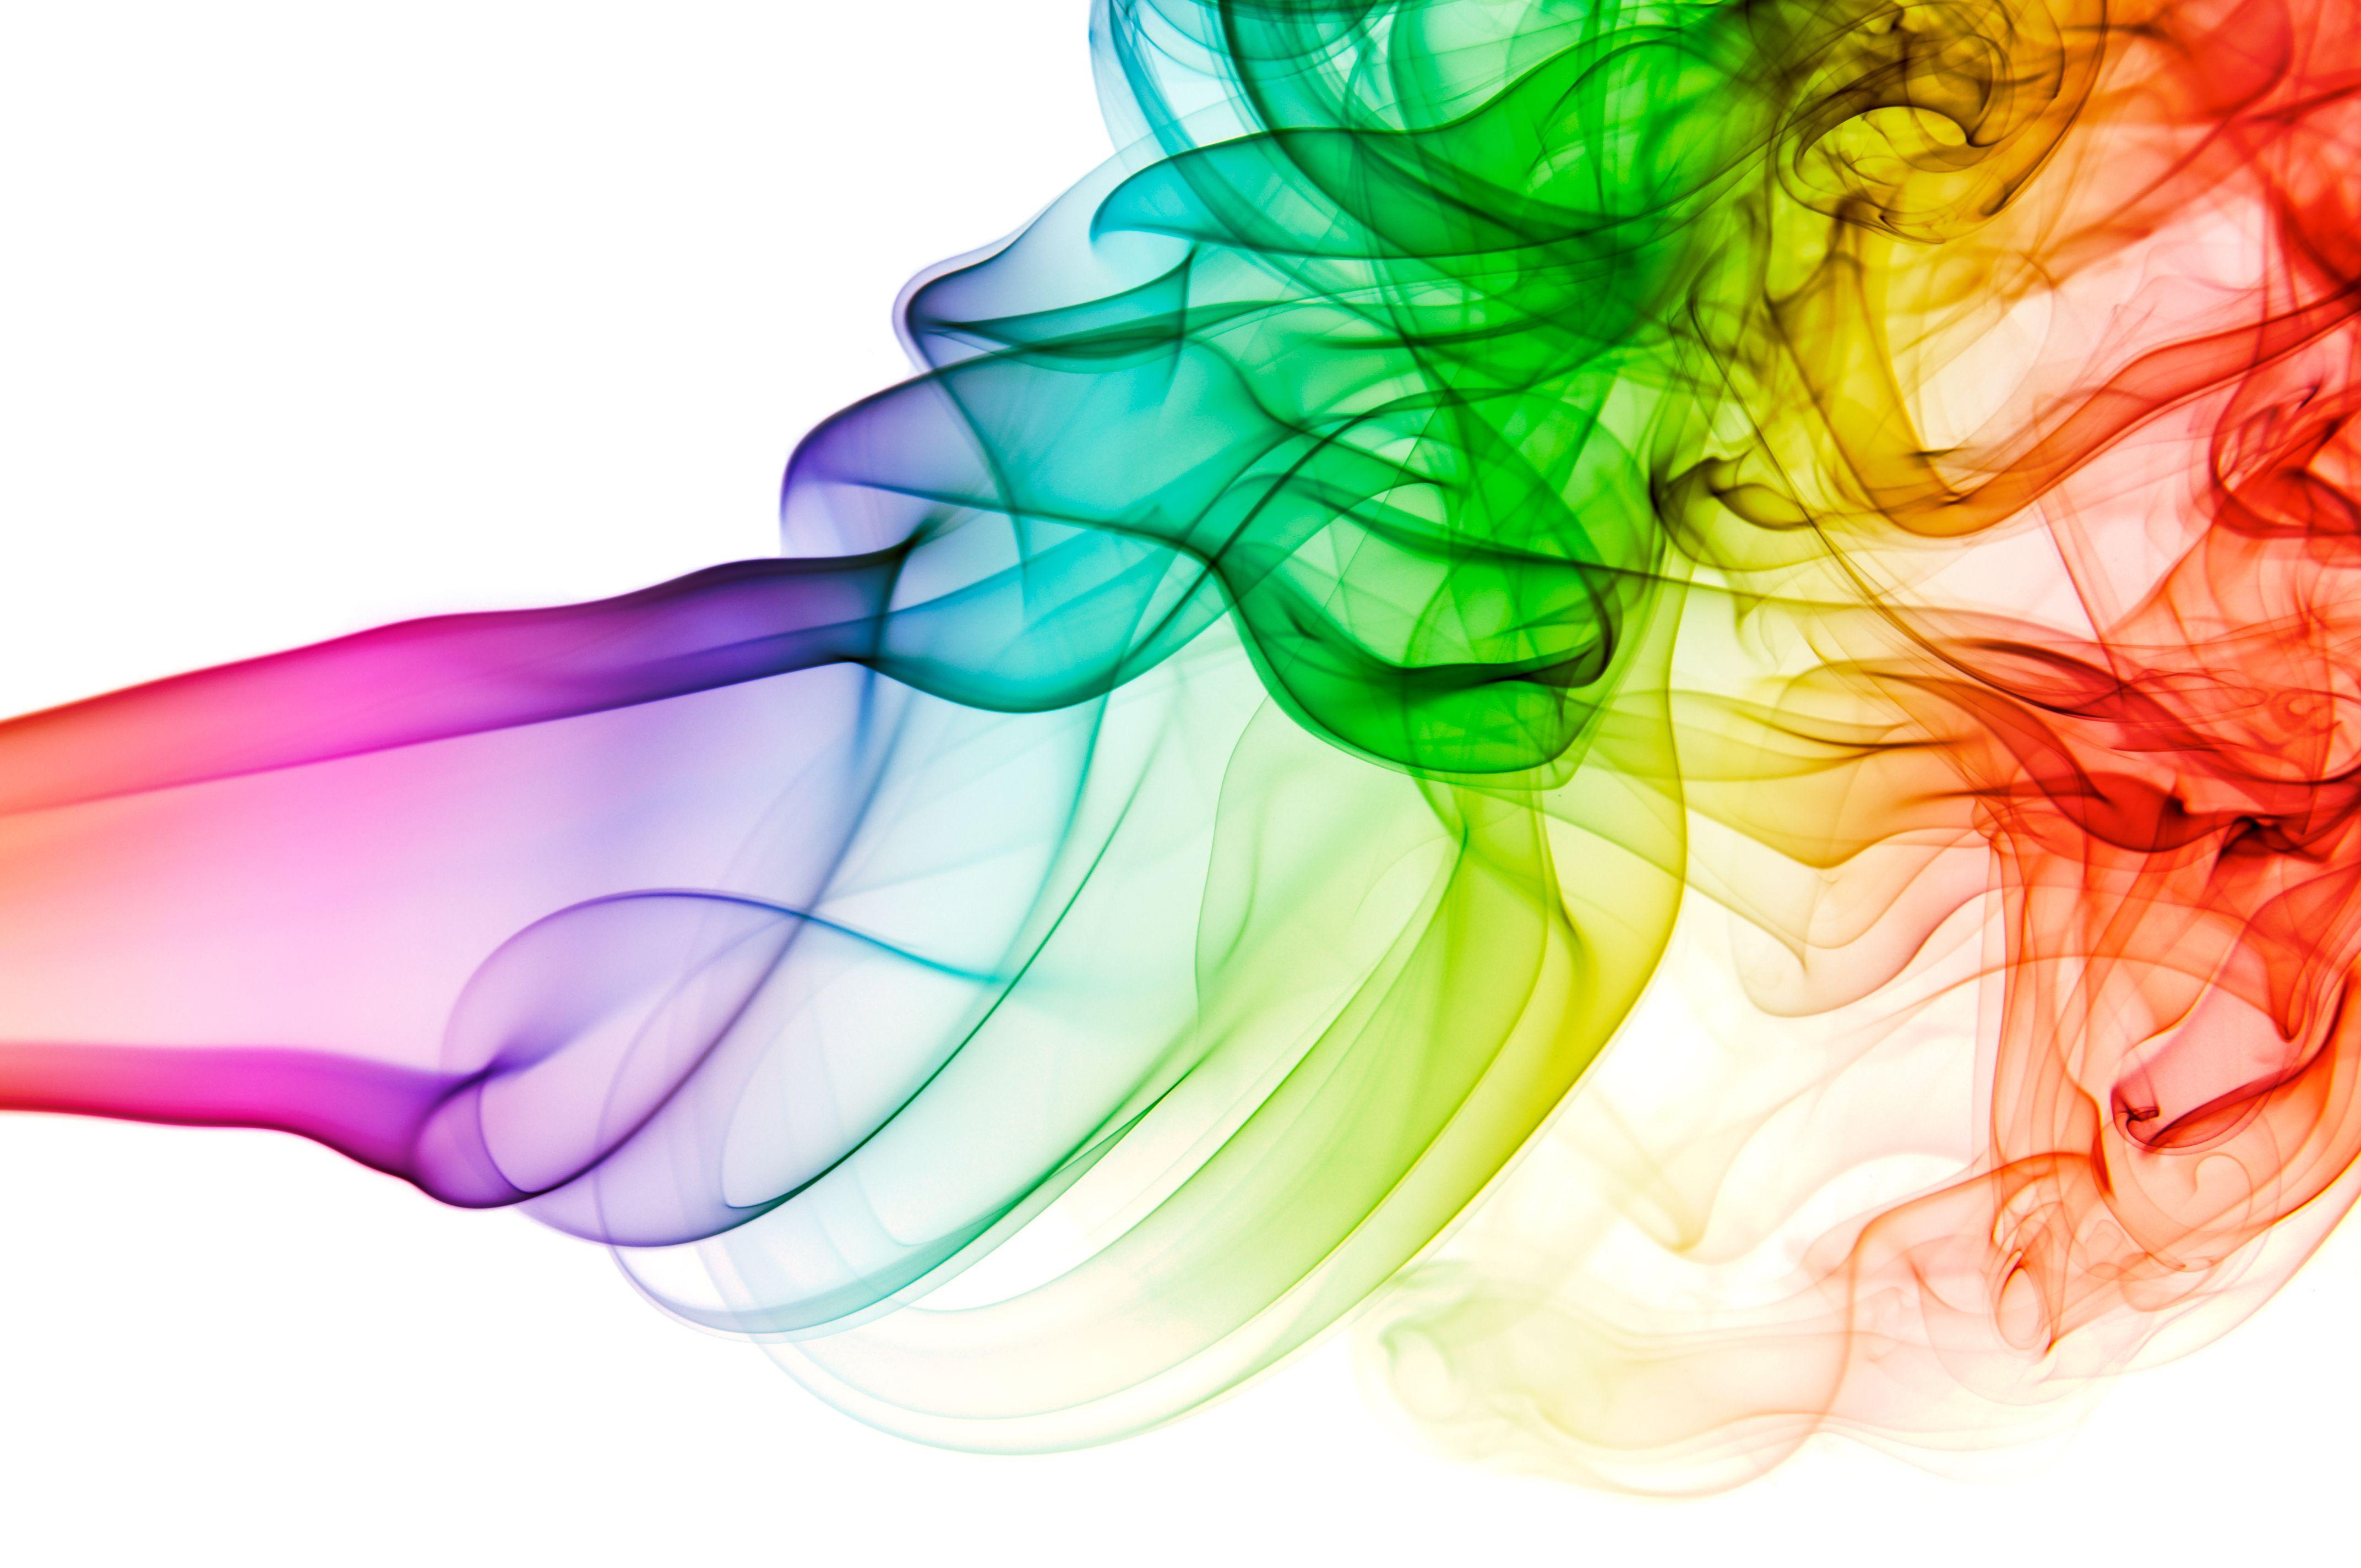 Rainbow Smoke Wallpaper Hd E Pinterest Smoke Wallpaper Smoke